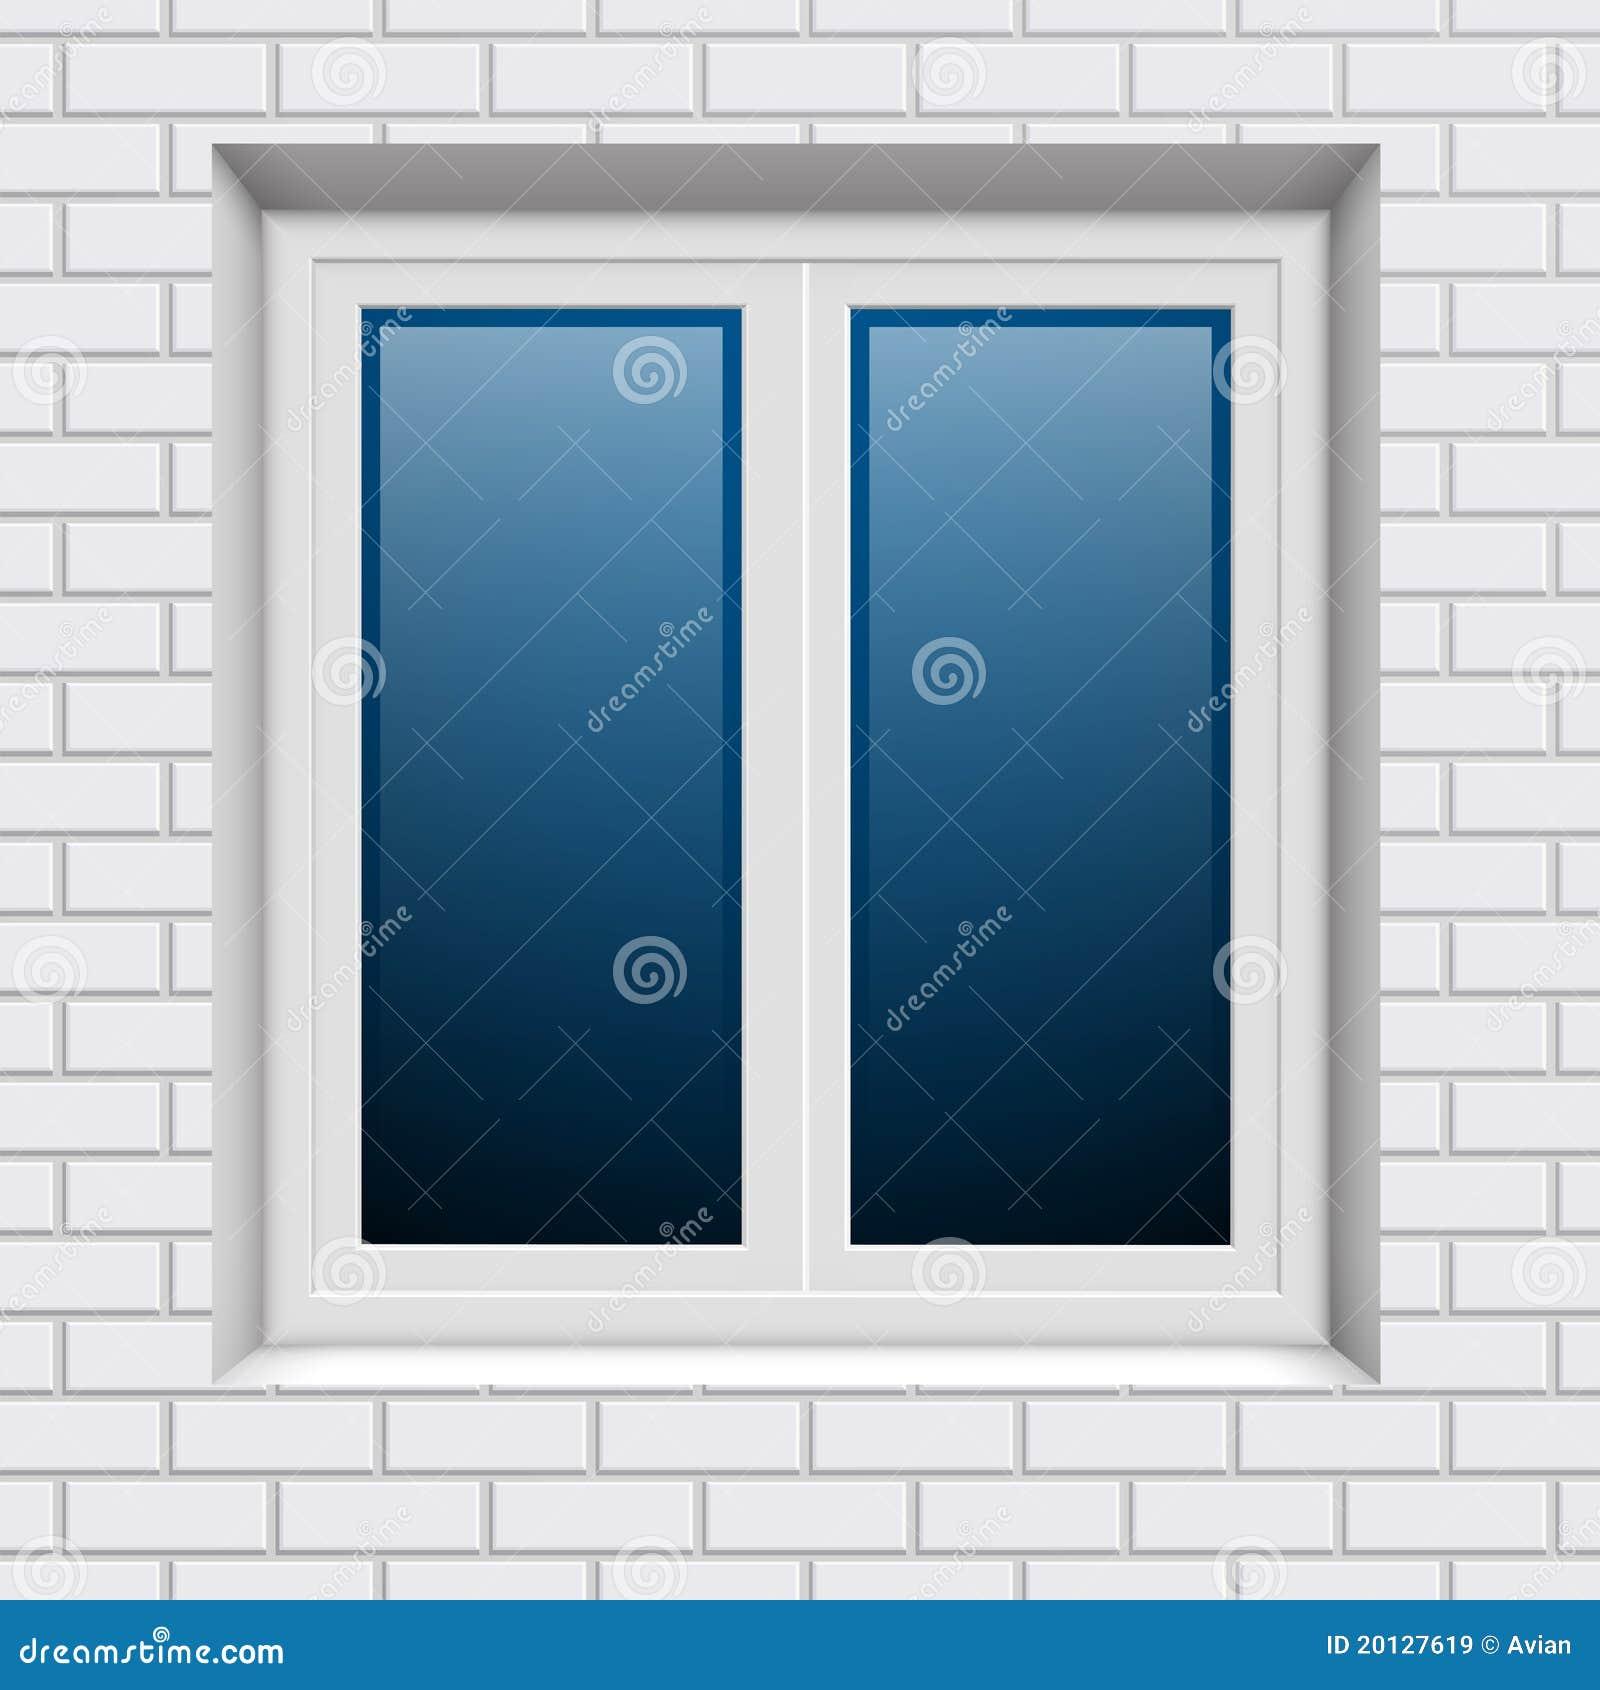 Building A Brick Wall Around A Window